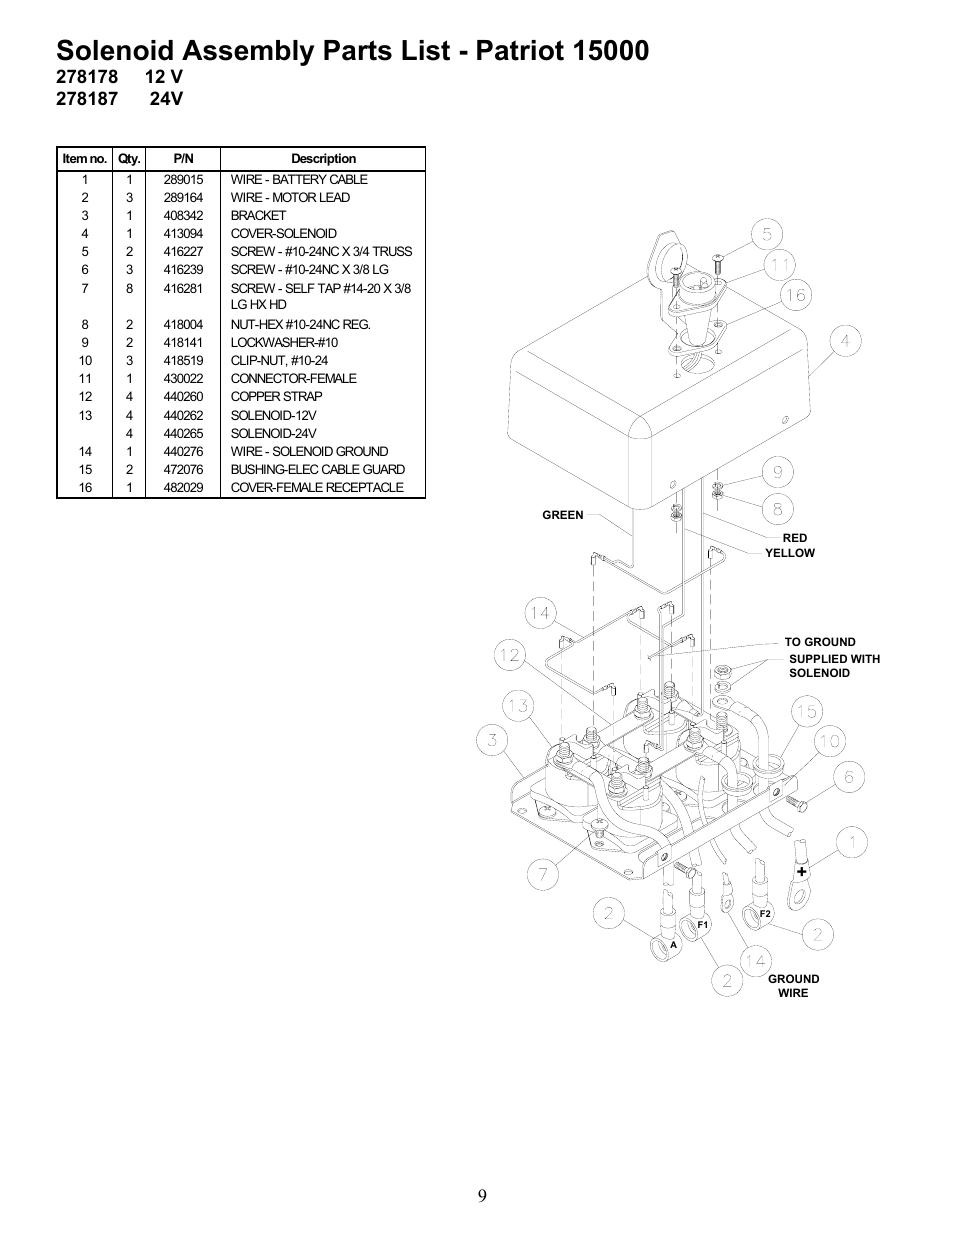 Winch Wiring Diagram Also Ramsey Winch Solenoid Wiring Diagram On